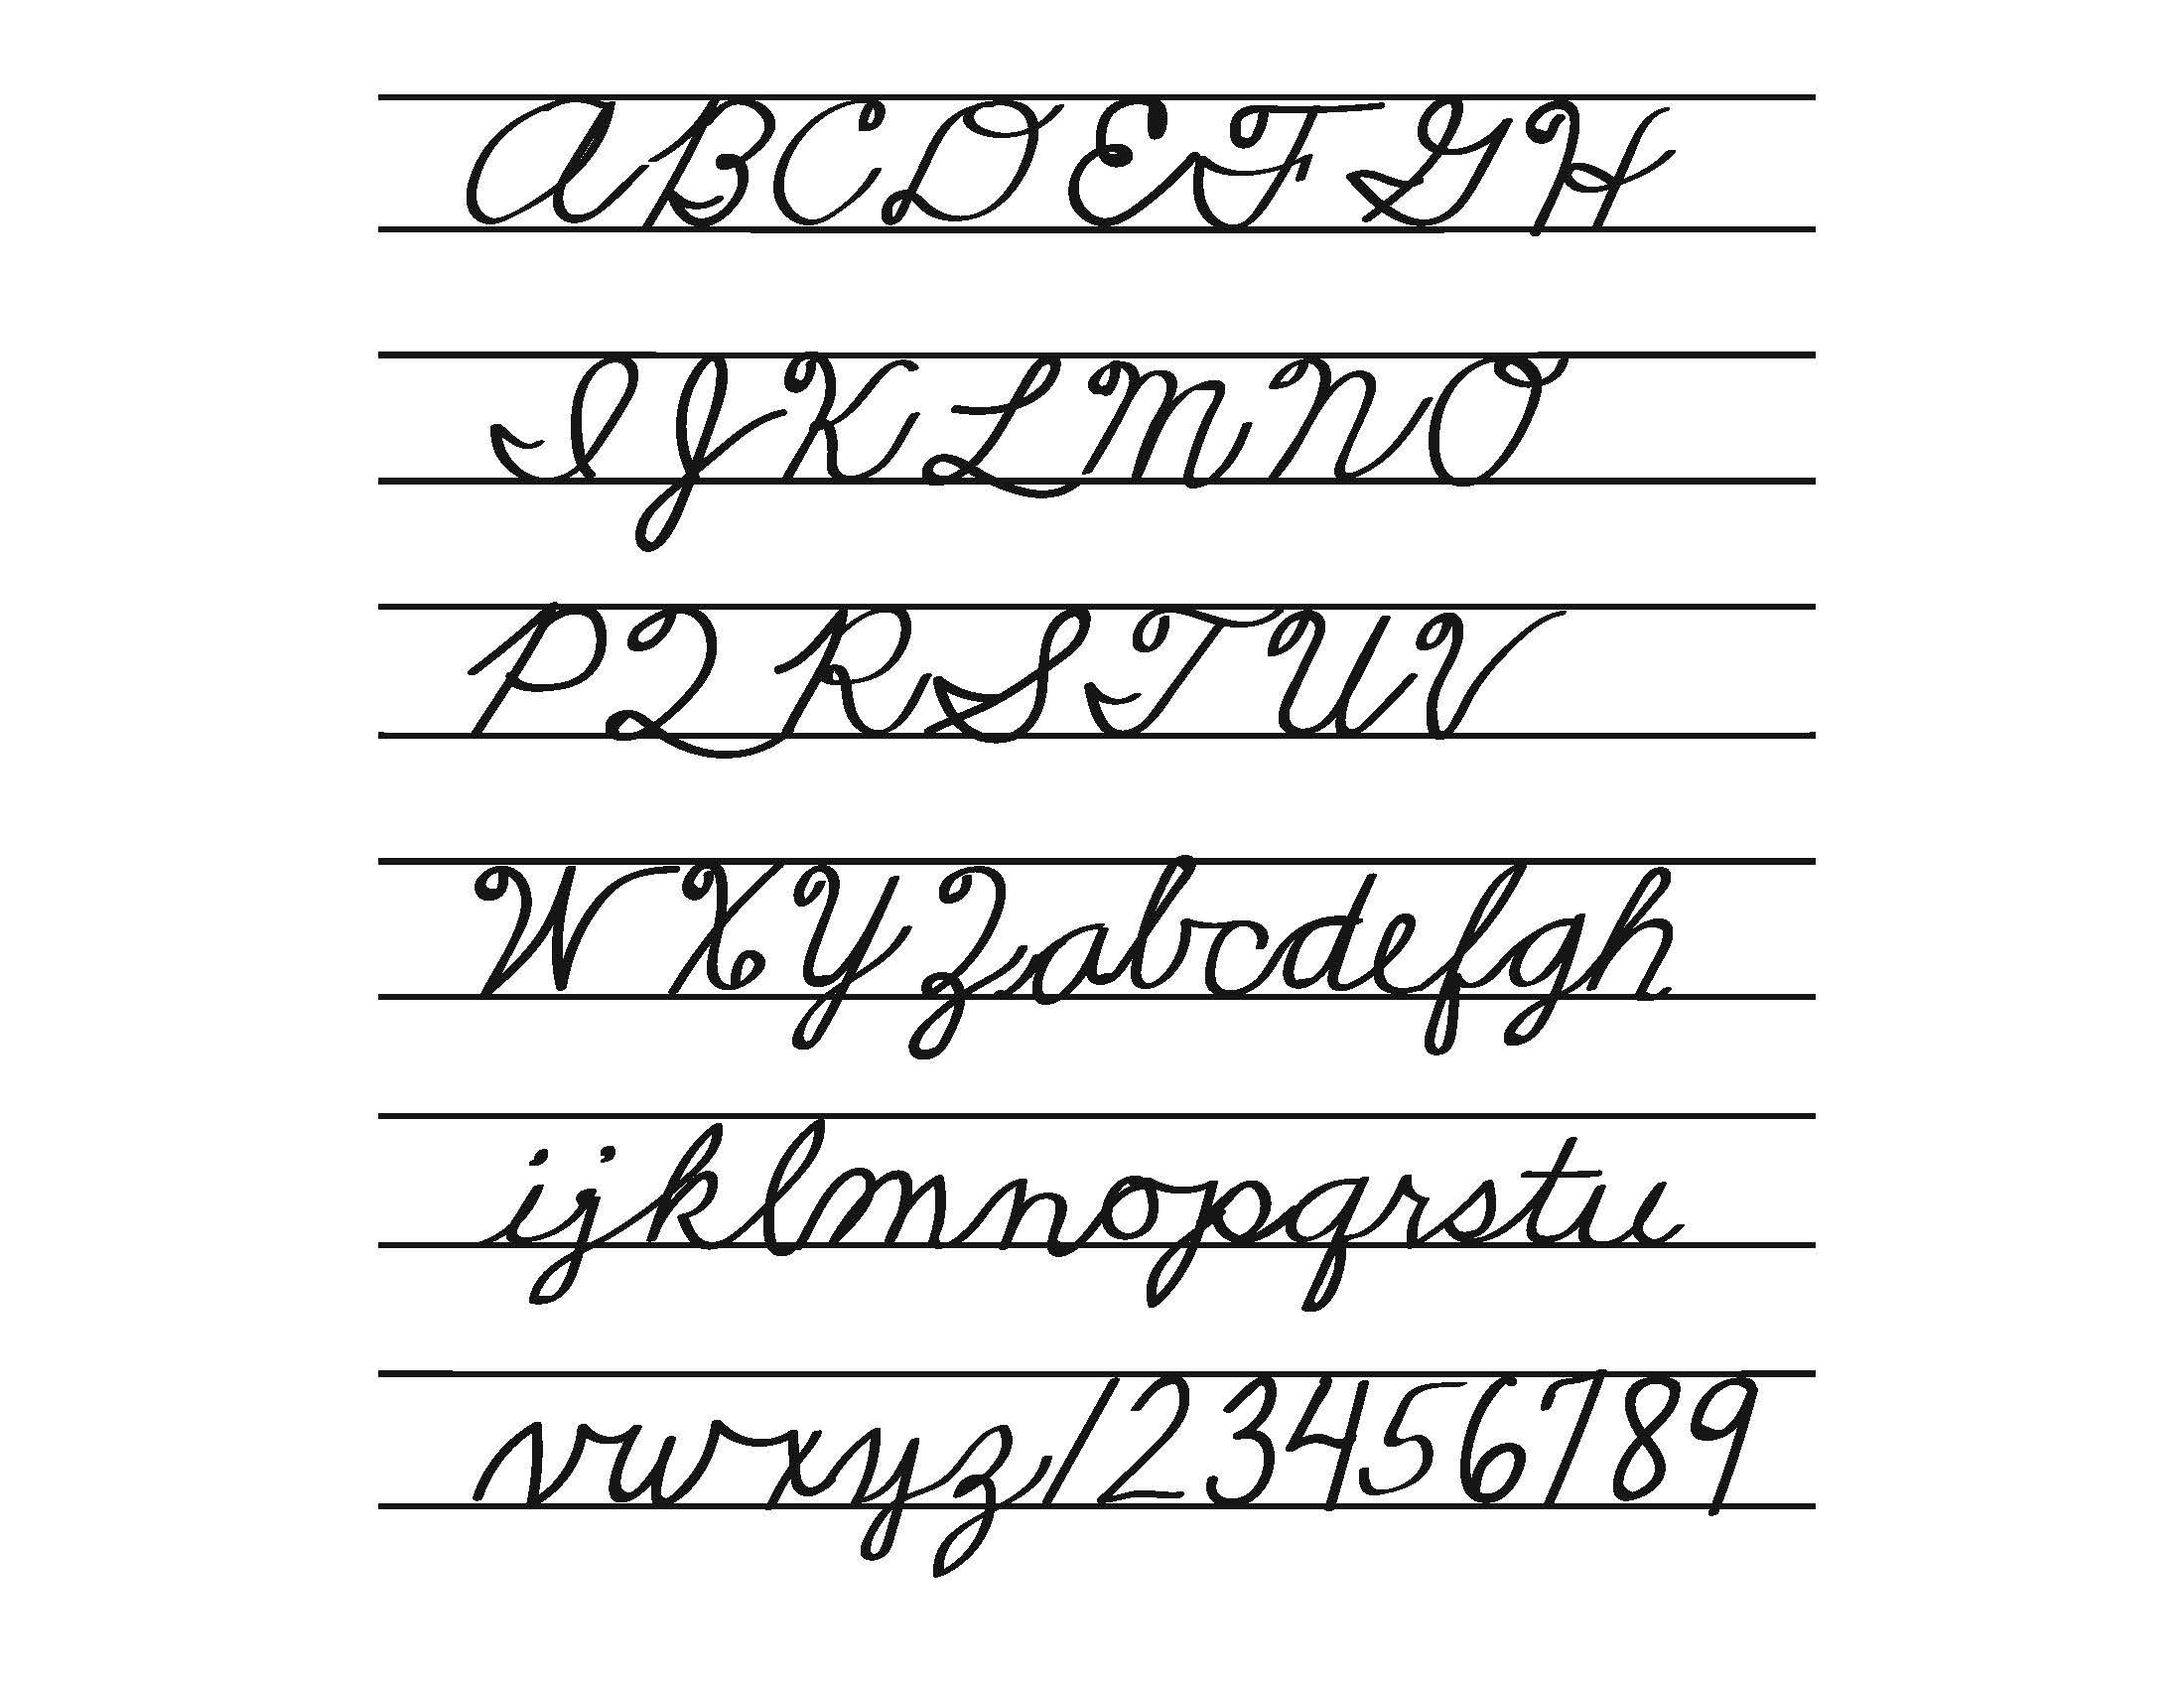 worksheet Zaner Bloser Handwriting Worksheets the art of handwritten letterform zaner bloser